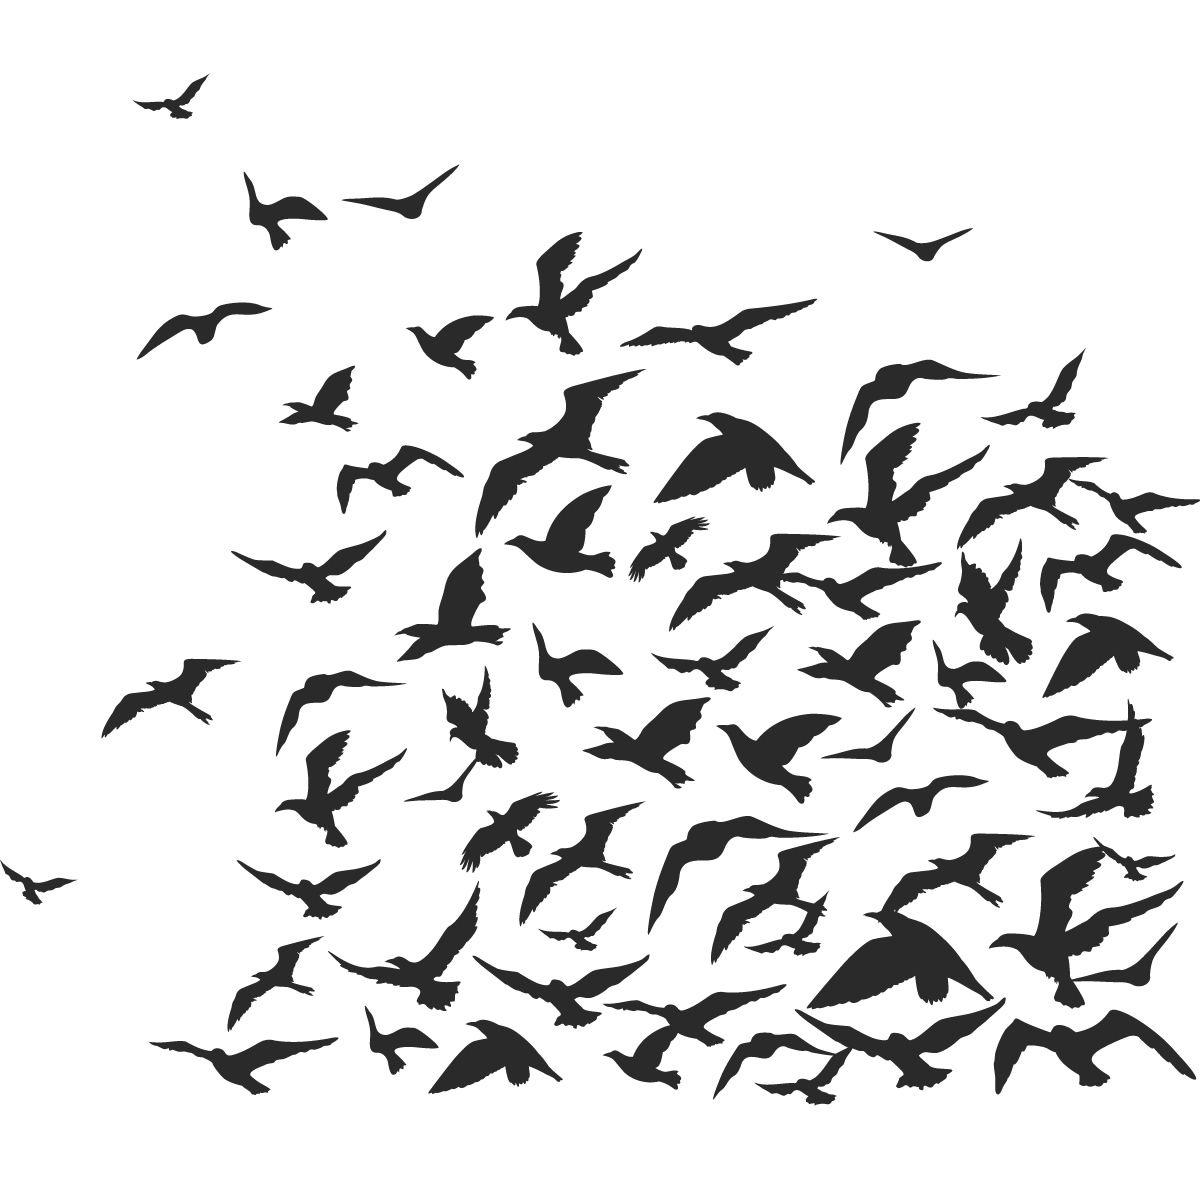 Flock Of Birds Animals Wall Art Decal Wall Stickers